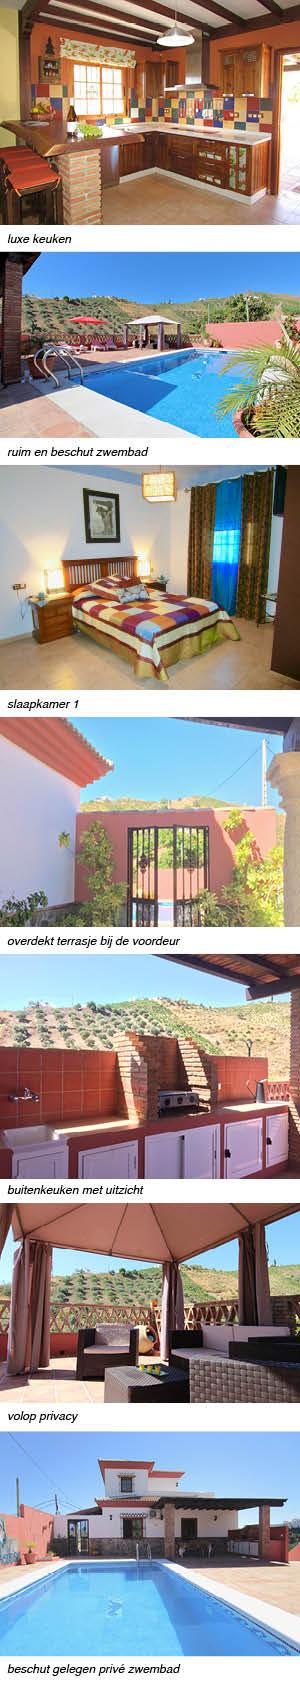 Villa Guti interieur fotos rechts